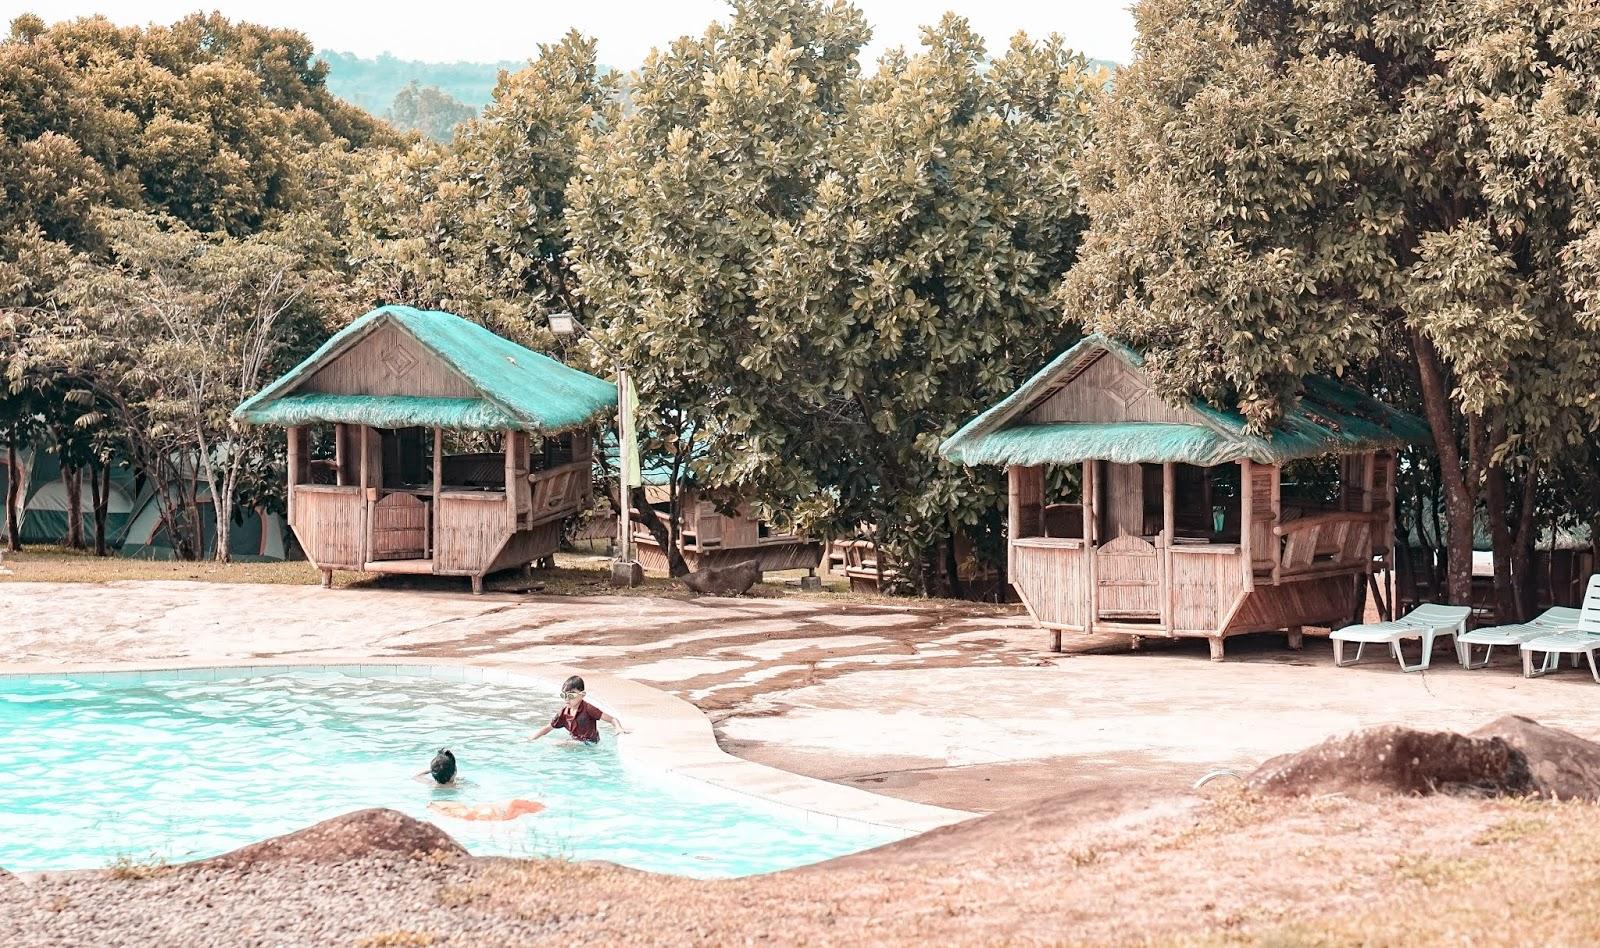 Mountain Lake Resort + Things to Do During Your Stay;Caliraya Lake, Caliraya Spring Golf Course, Mountain lake Resort, golf course in Laguna